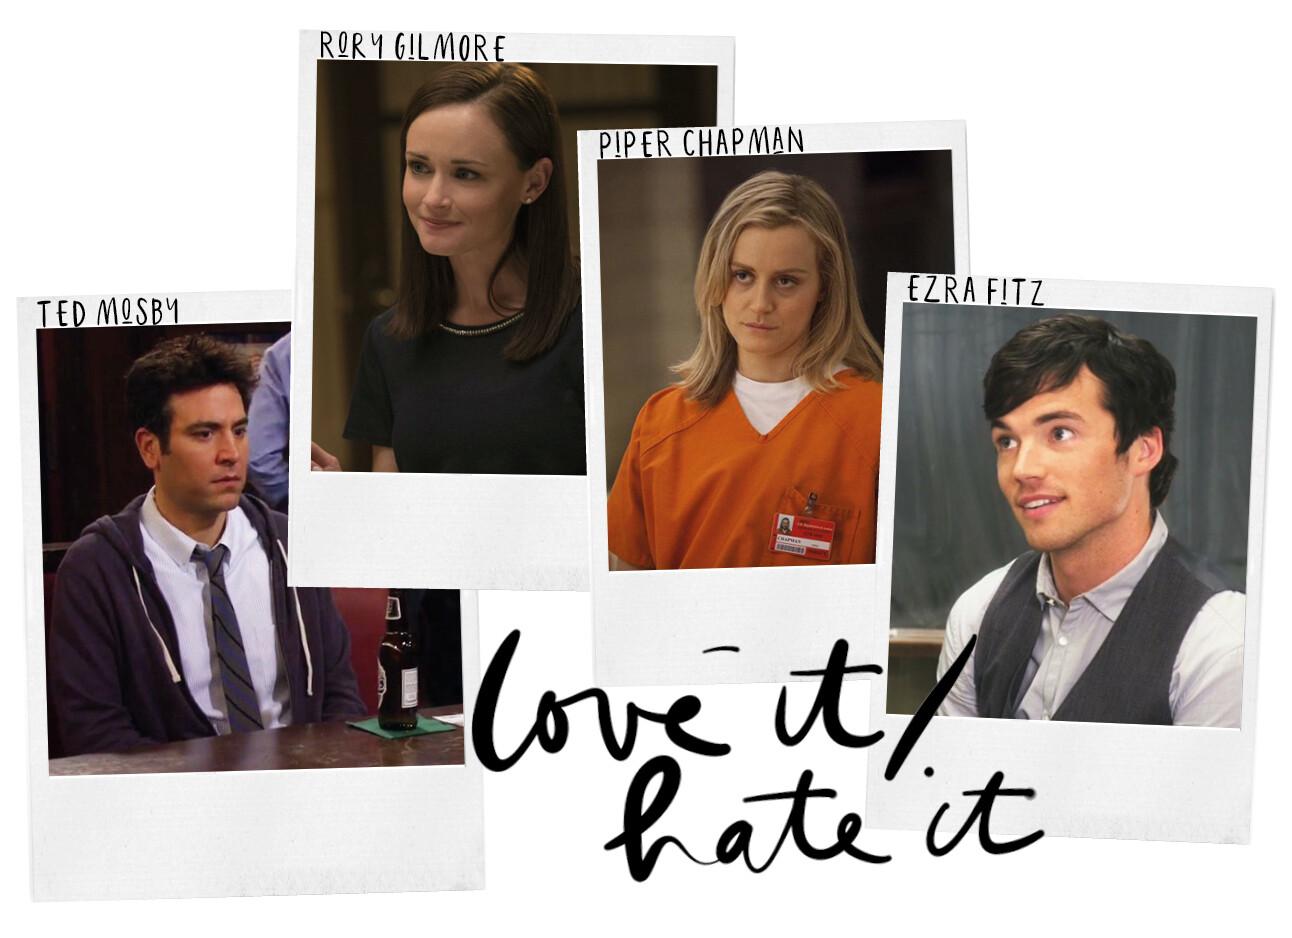 TV personages die we leuk vinden maar ook weer niet